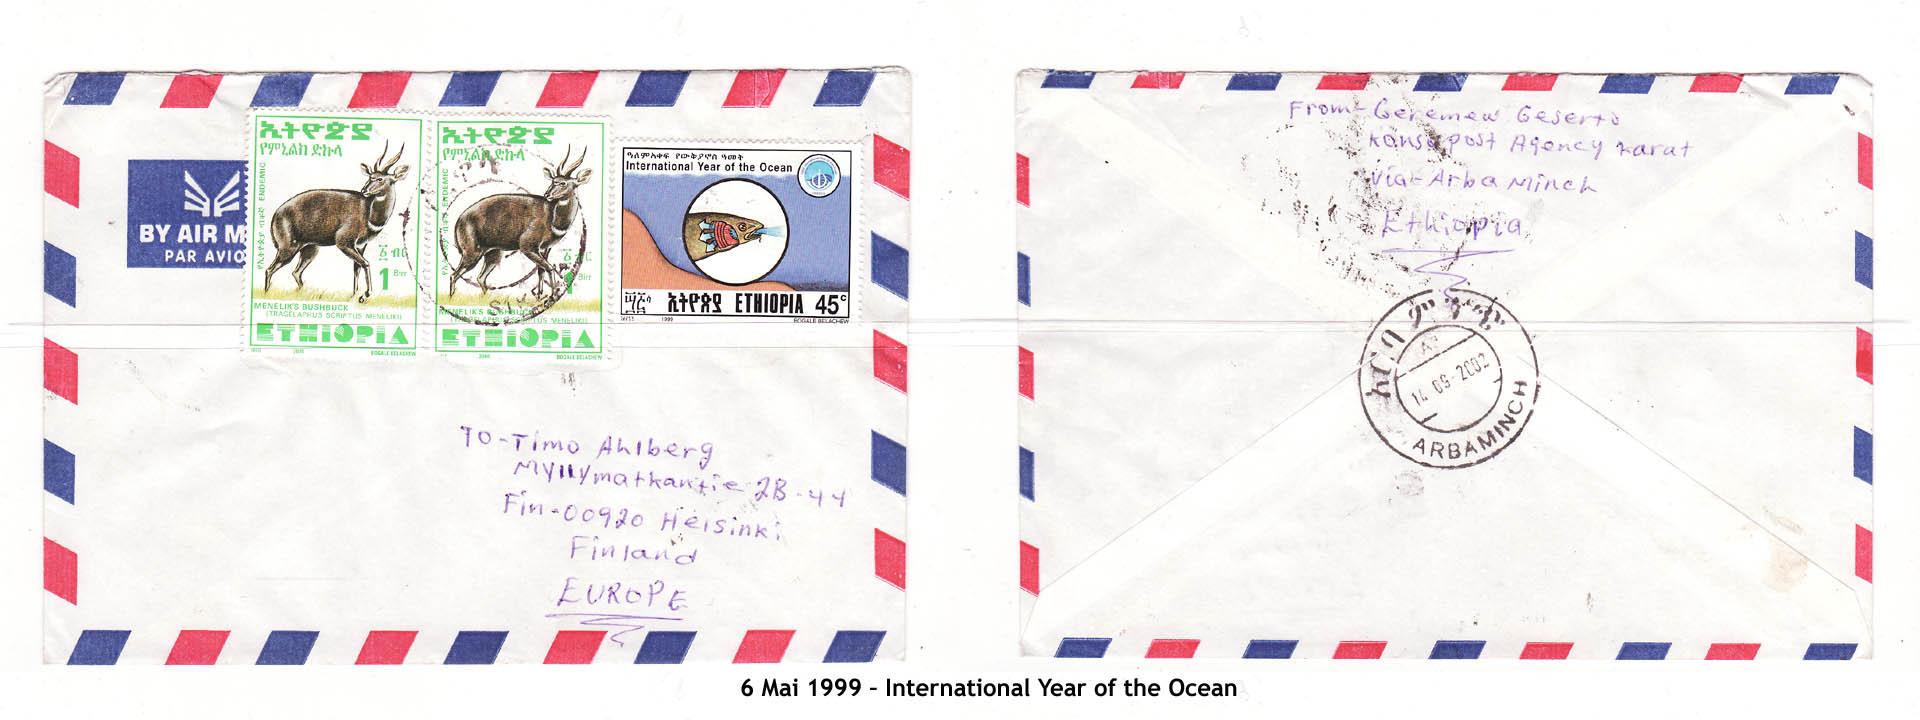 19990506 – International Year of the Ocean